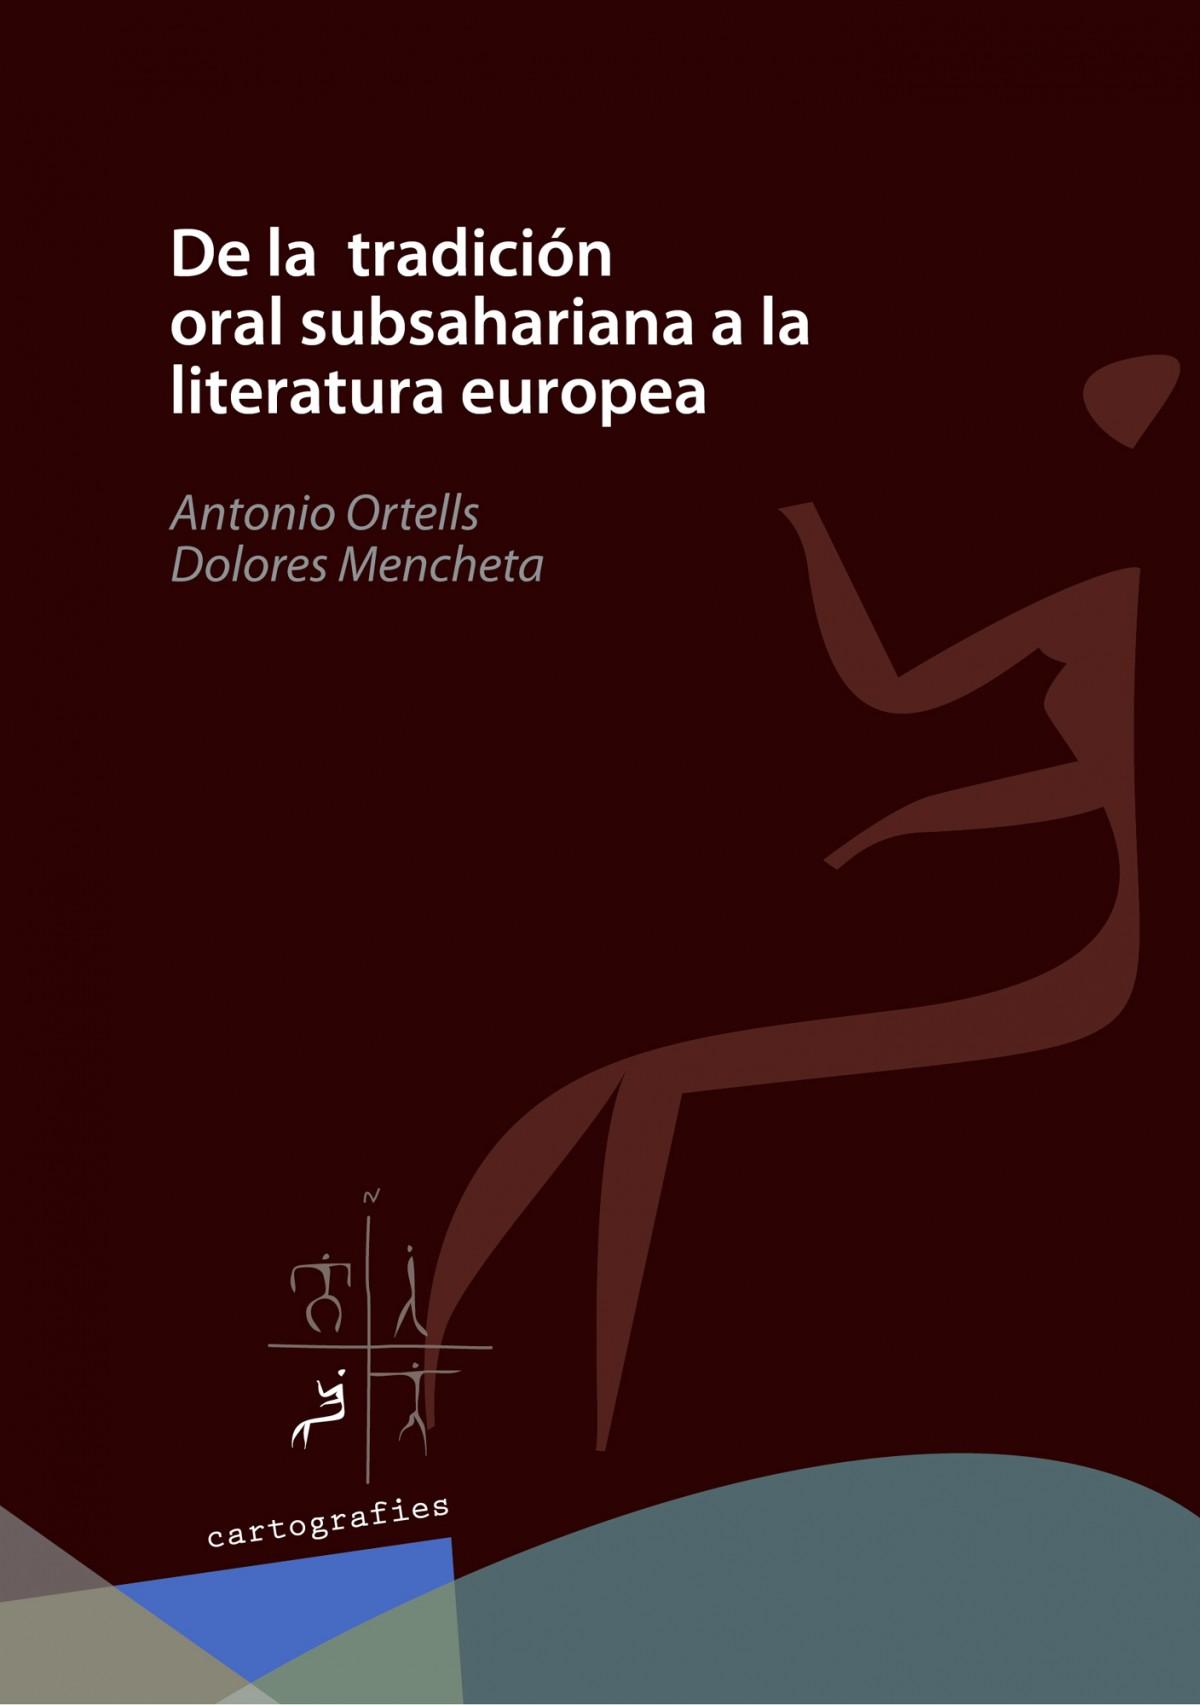 portada-4-Col-Cartografies-Periferic-disseny-Paco-Gimenez